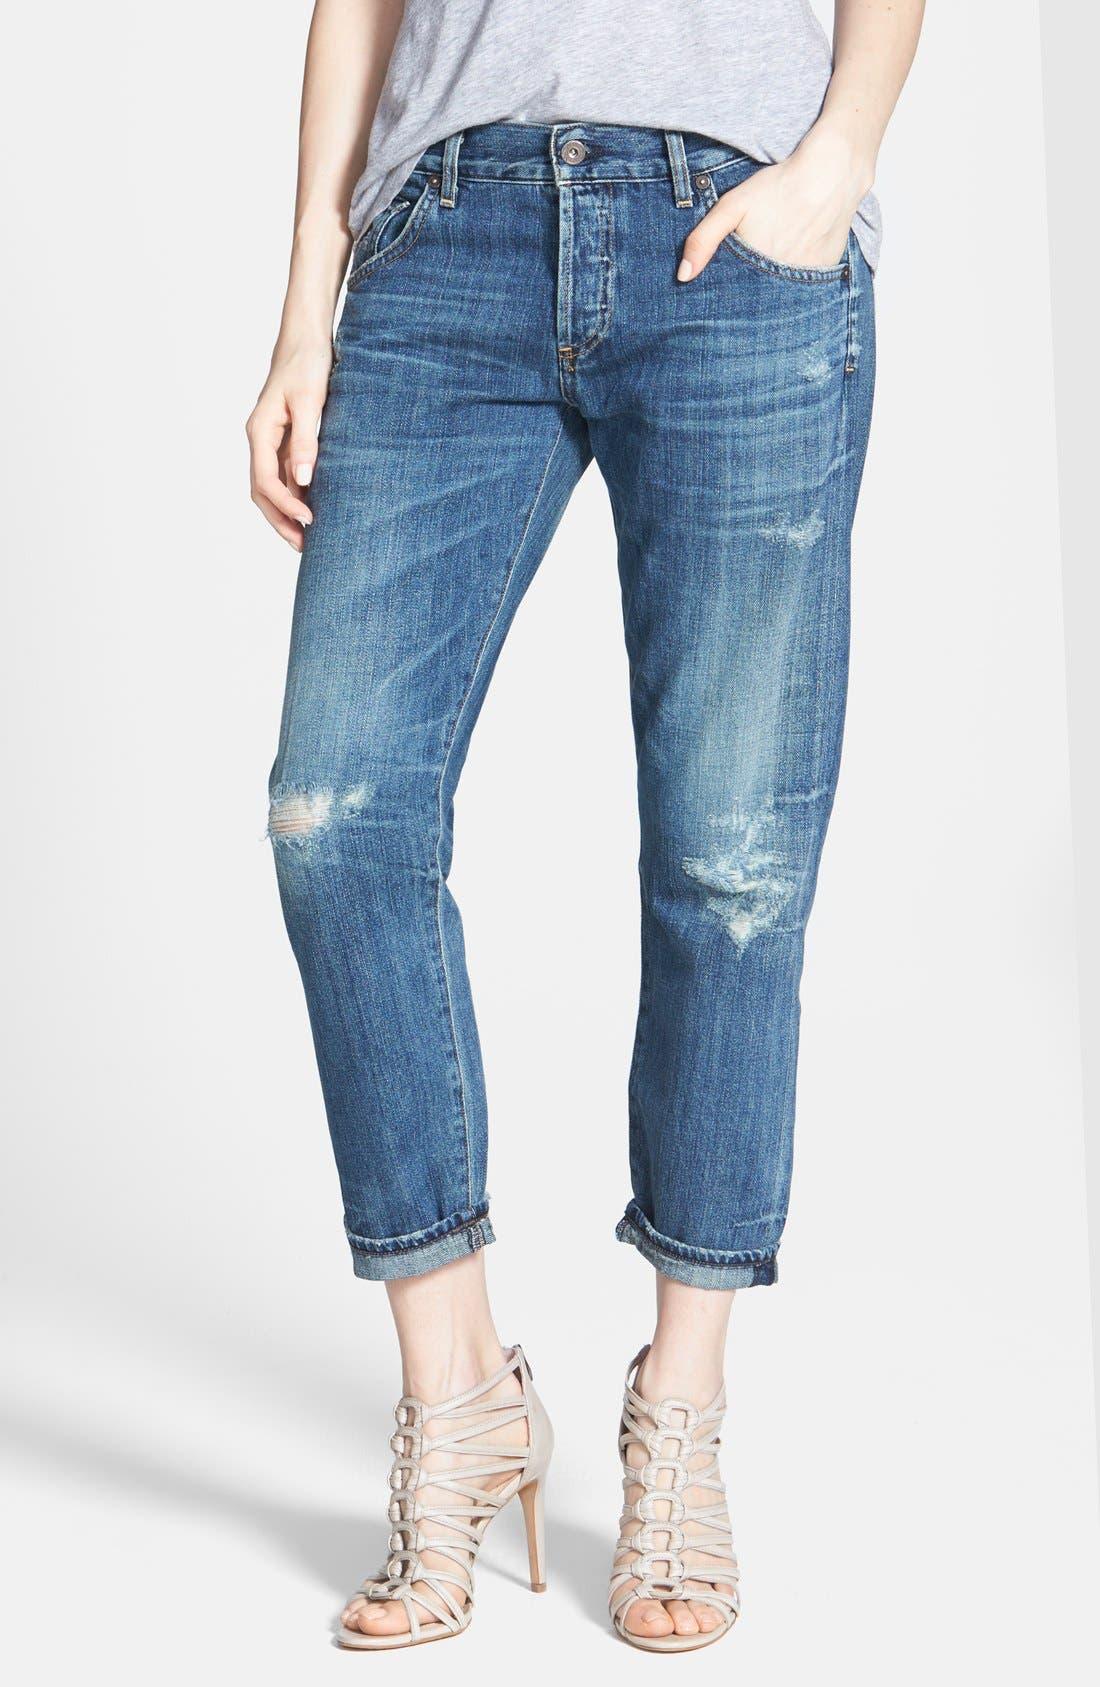 Alternate Image 1 Selected - Citizens of Humanity 'Premium Vintage - Skyler' Distressed Crop Jeans (Legacy)